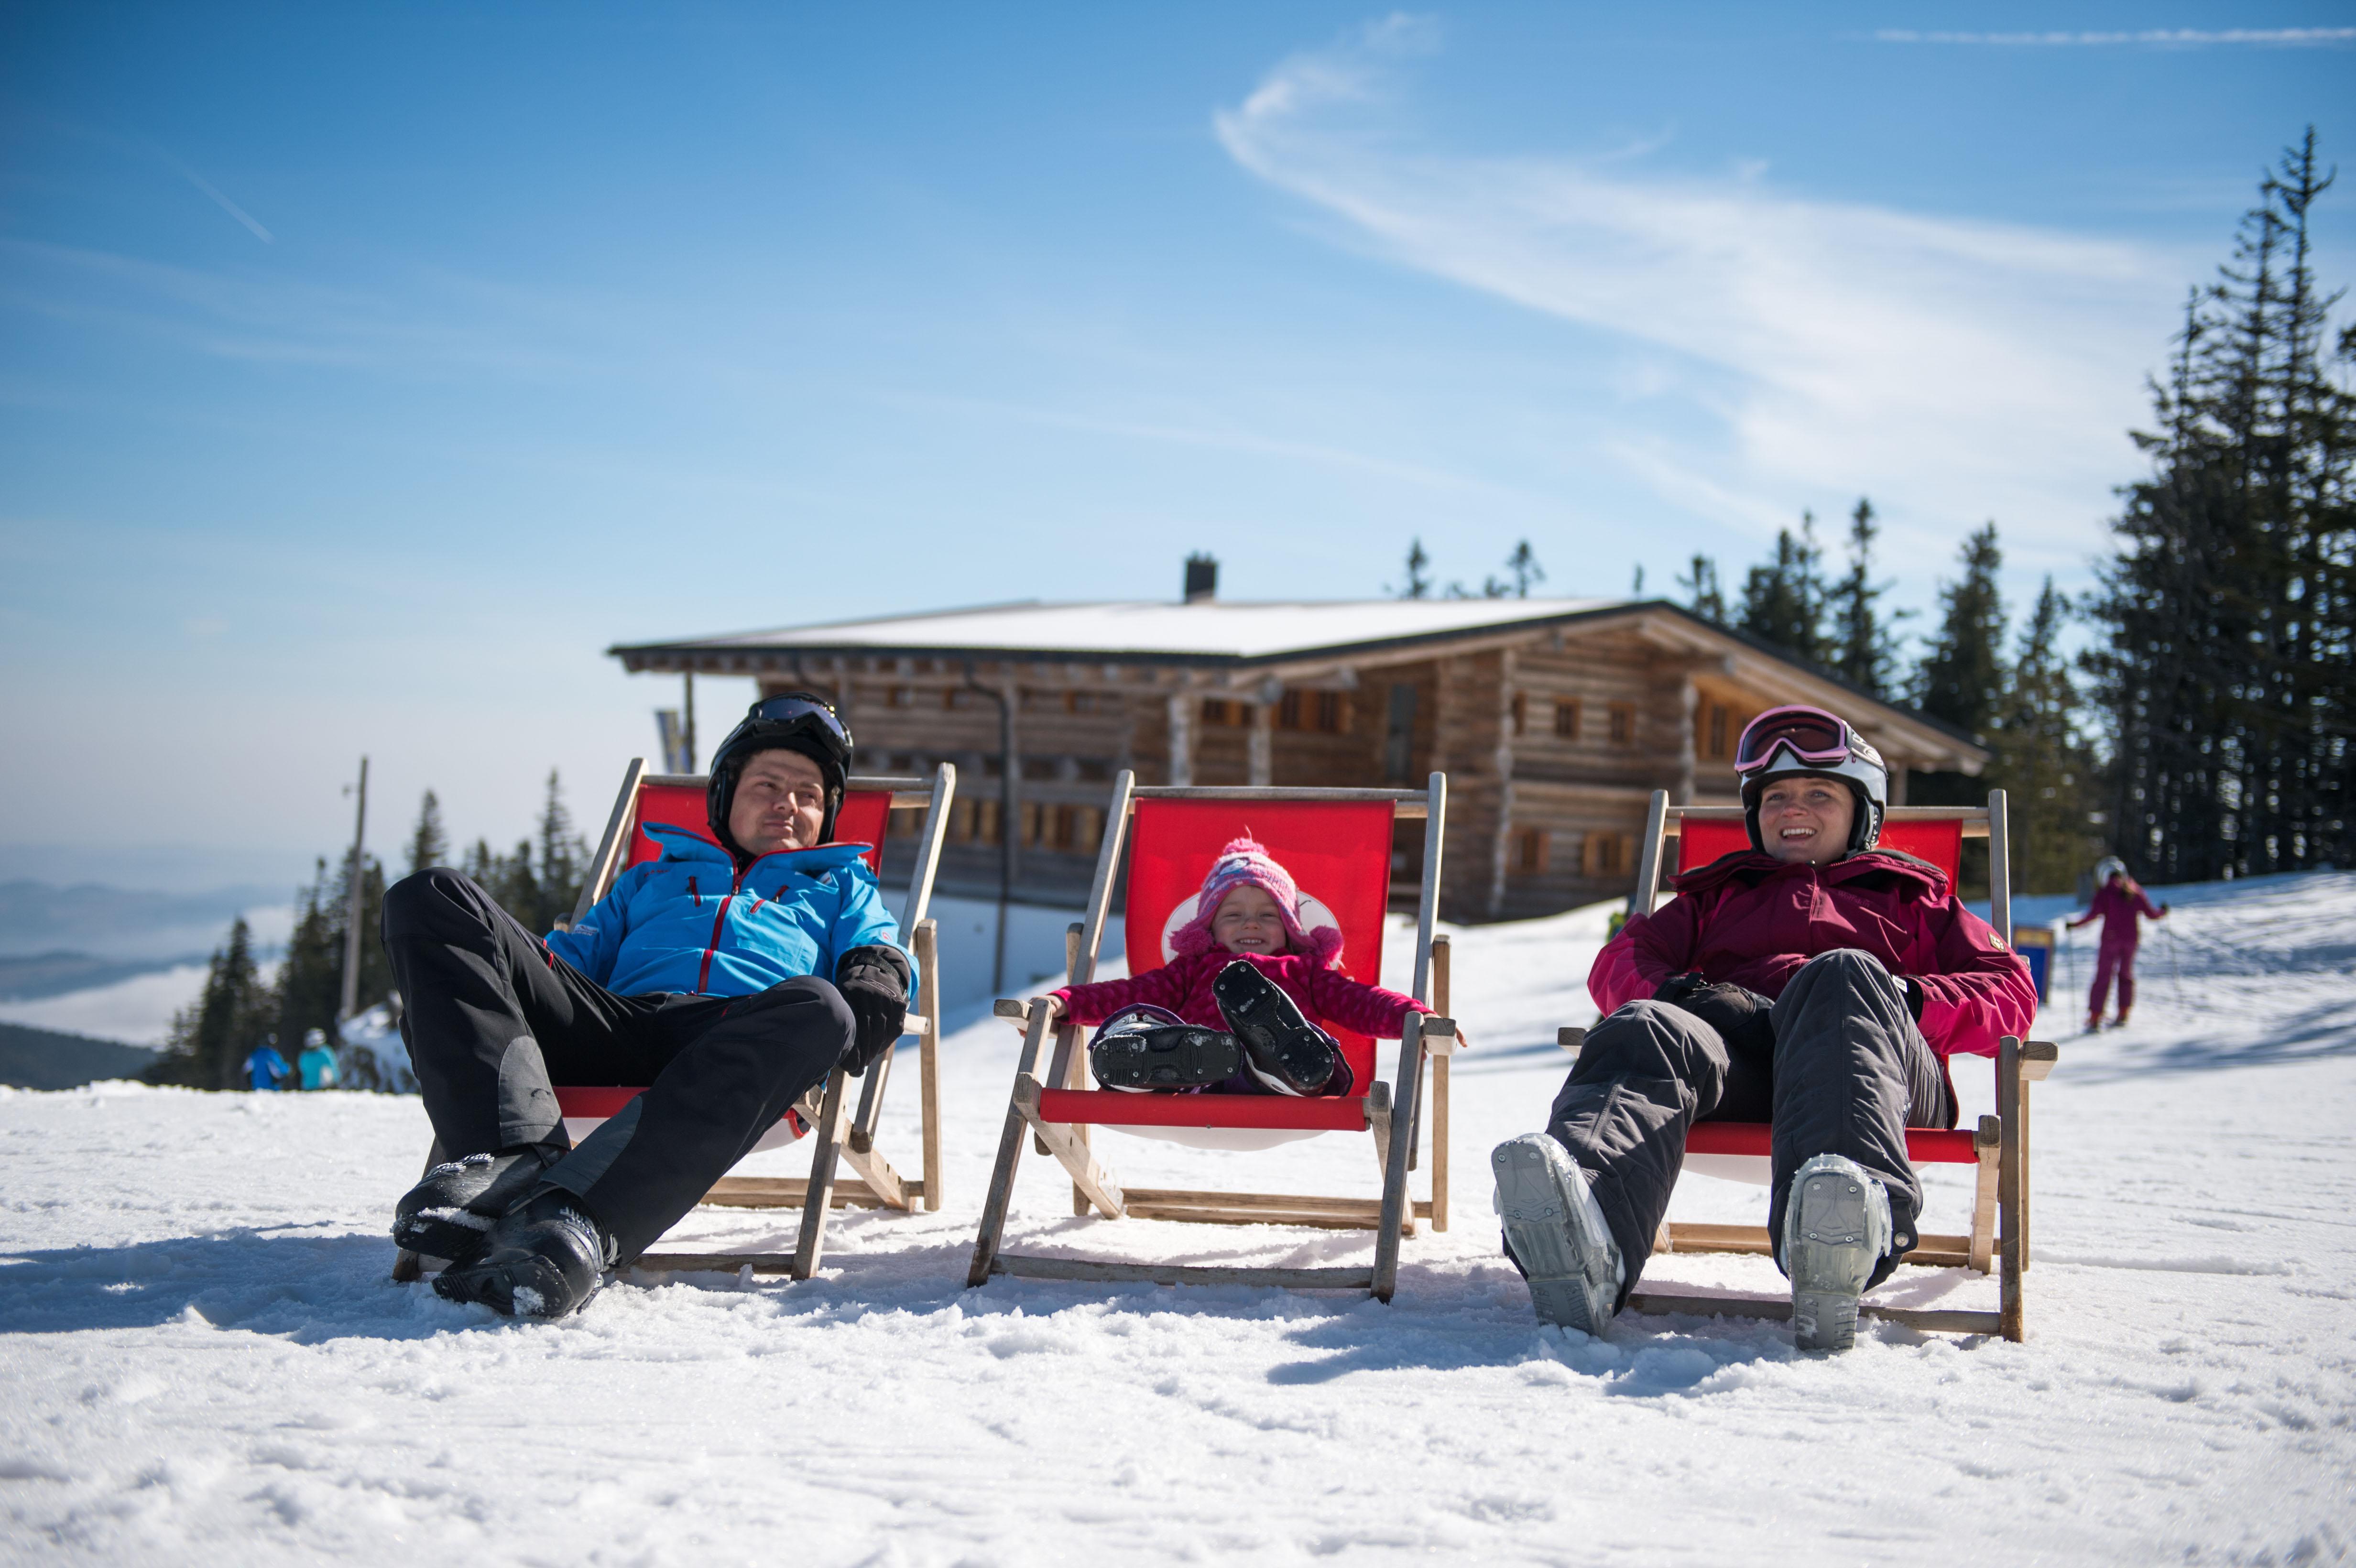 Mönichkirchen-Mariensee - Ski resorts in Lower Austria - Skiing and ...